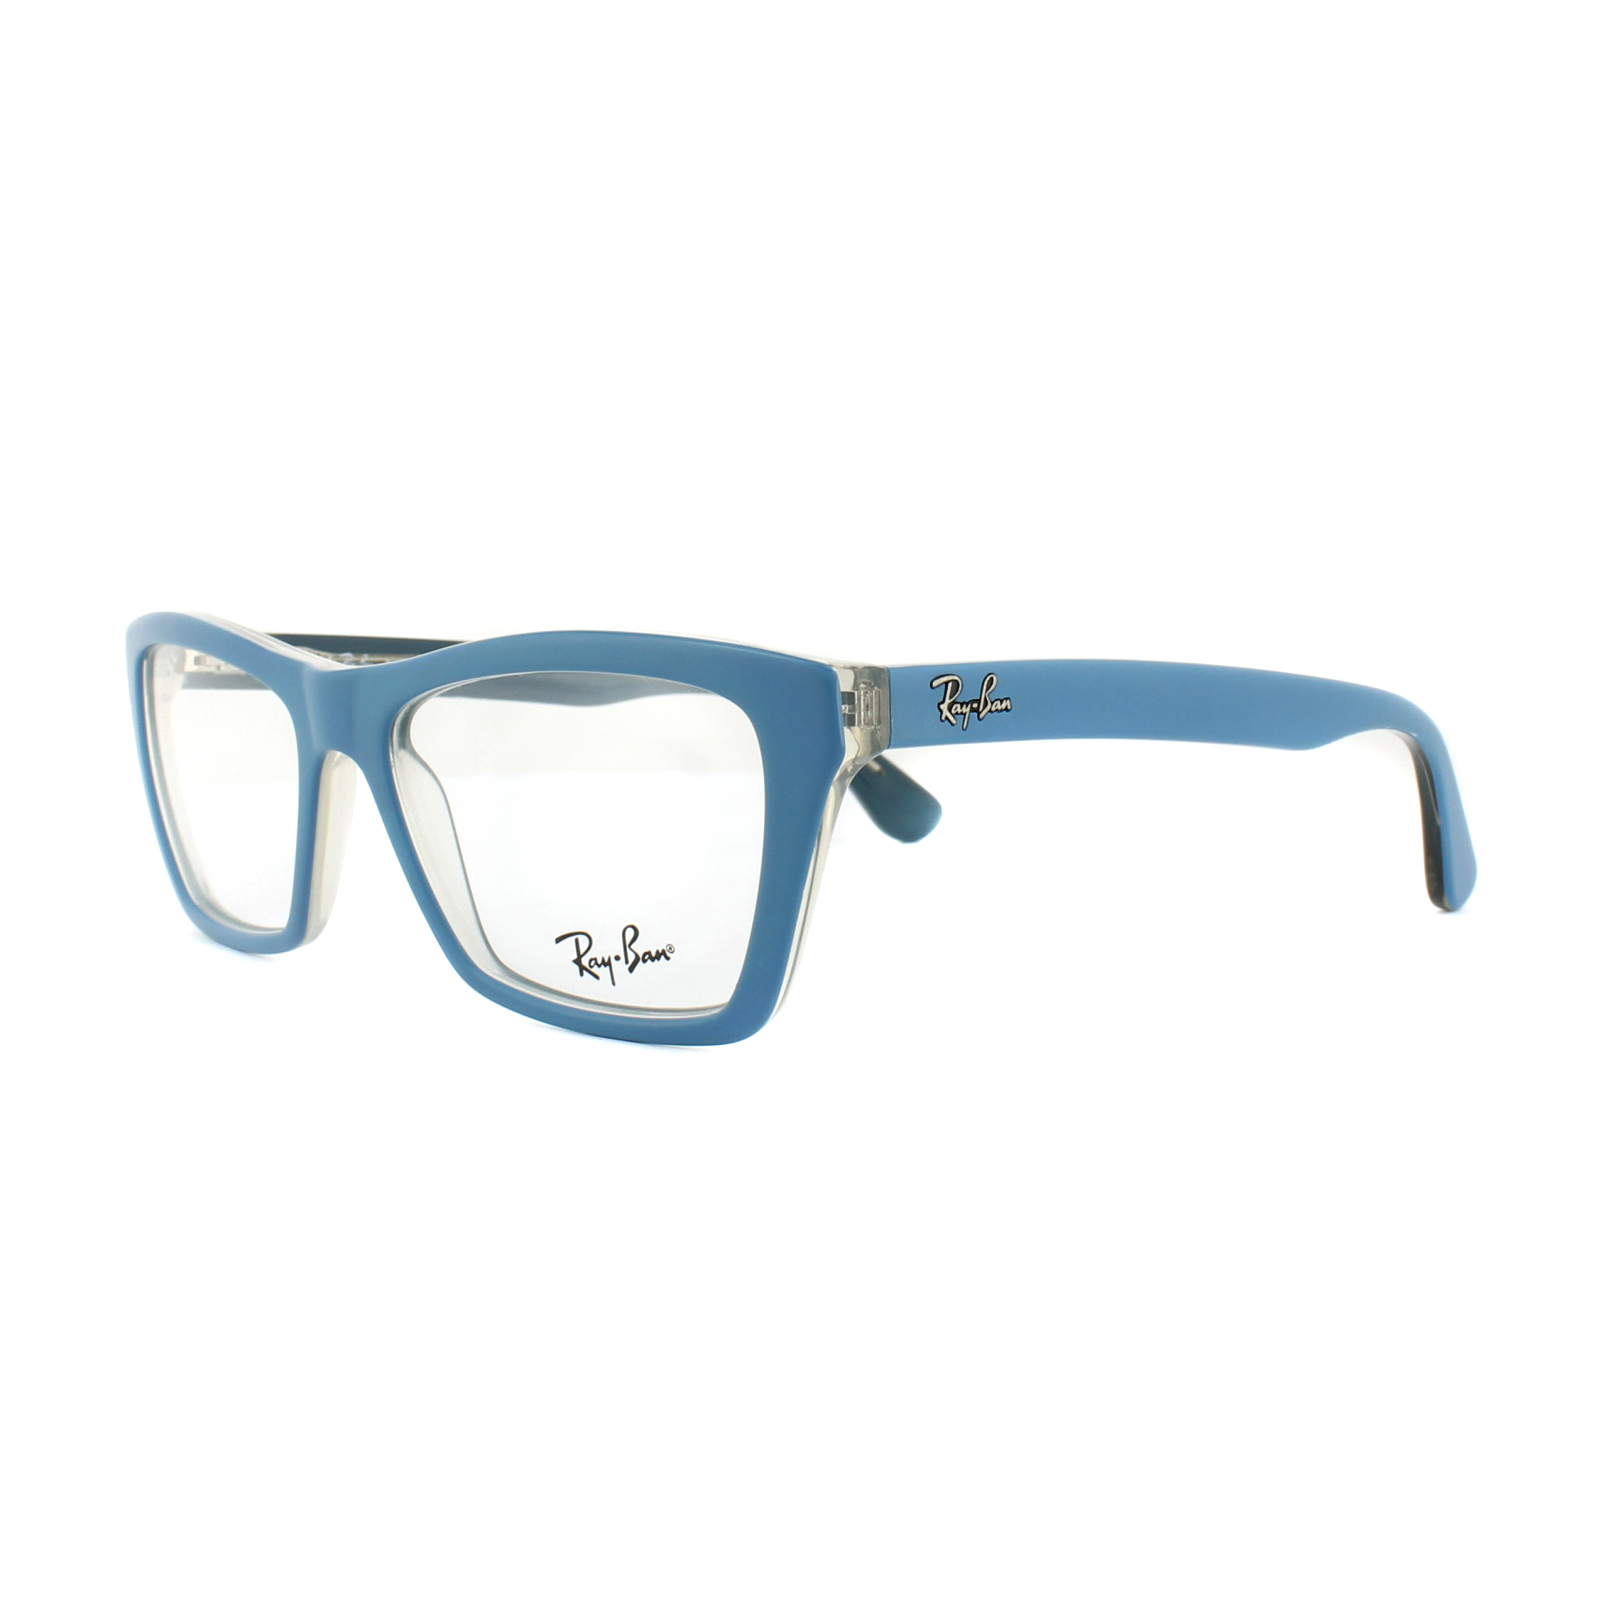 Ray-Ban Glasses Frames RX 5316 5391 Matt Blue on Transparent Beige ...